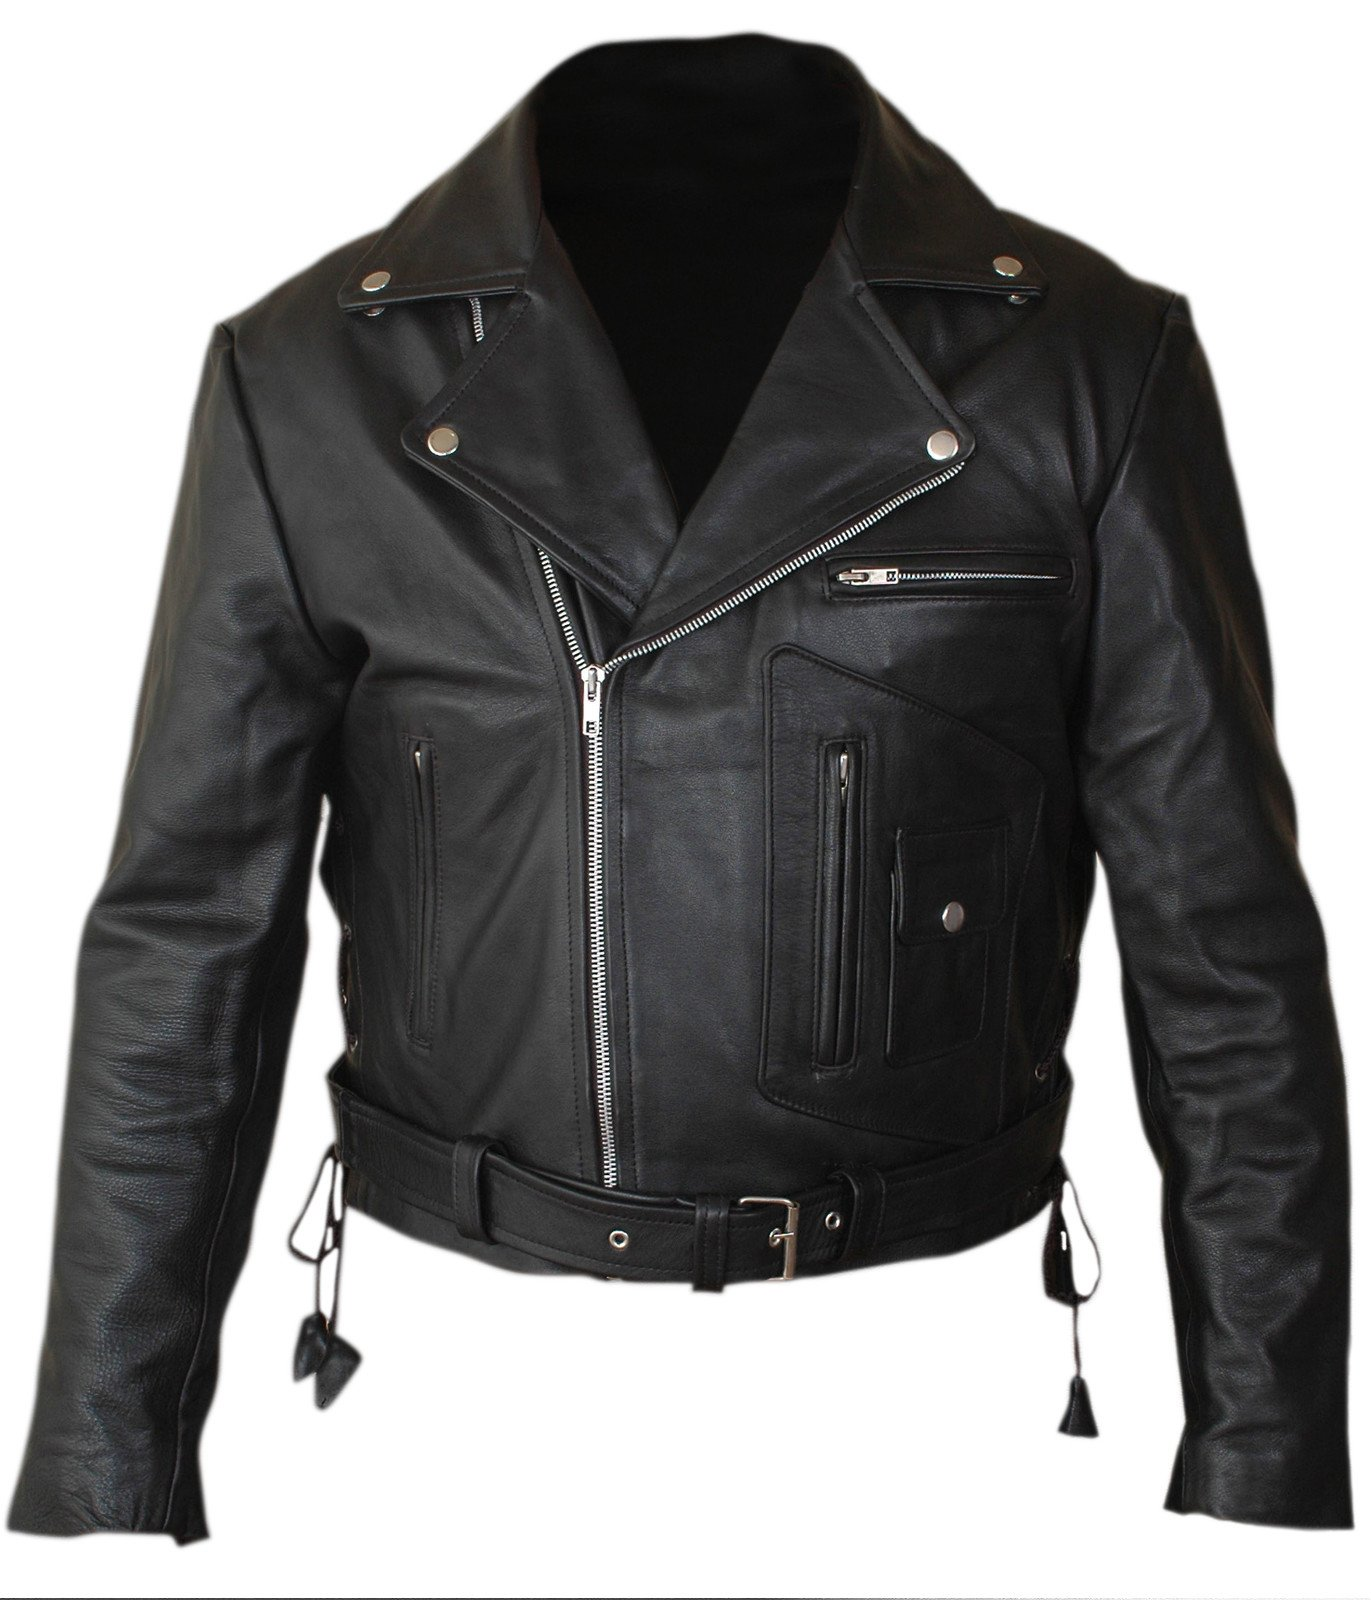 Flesh & Hide F&H Boy's Terminator 2 Judgment Day Arnold Genuine Leather Jacket S Black